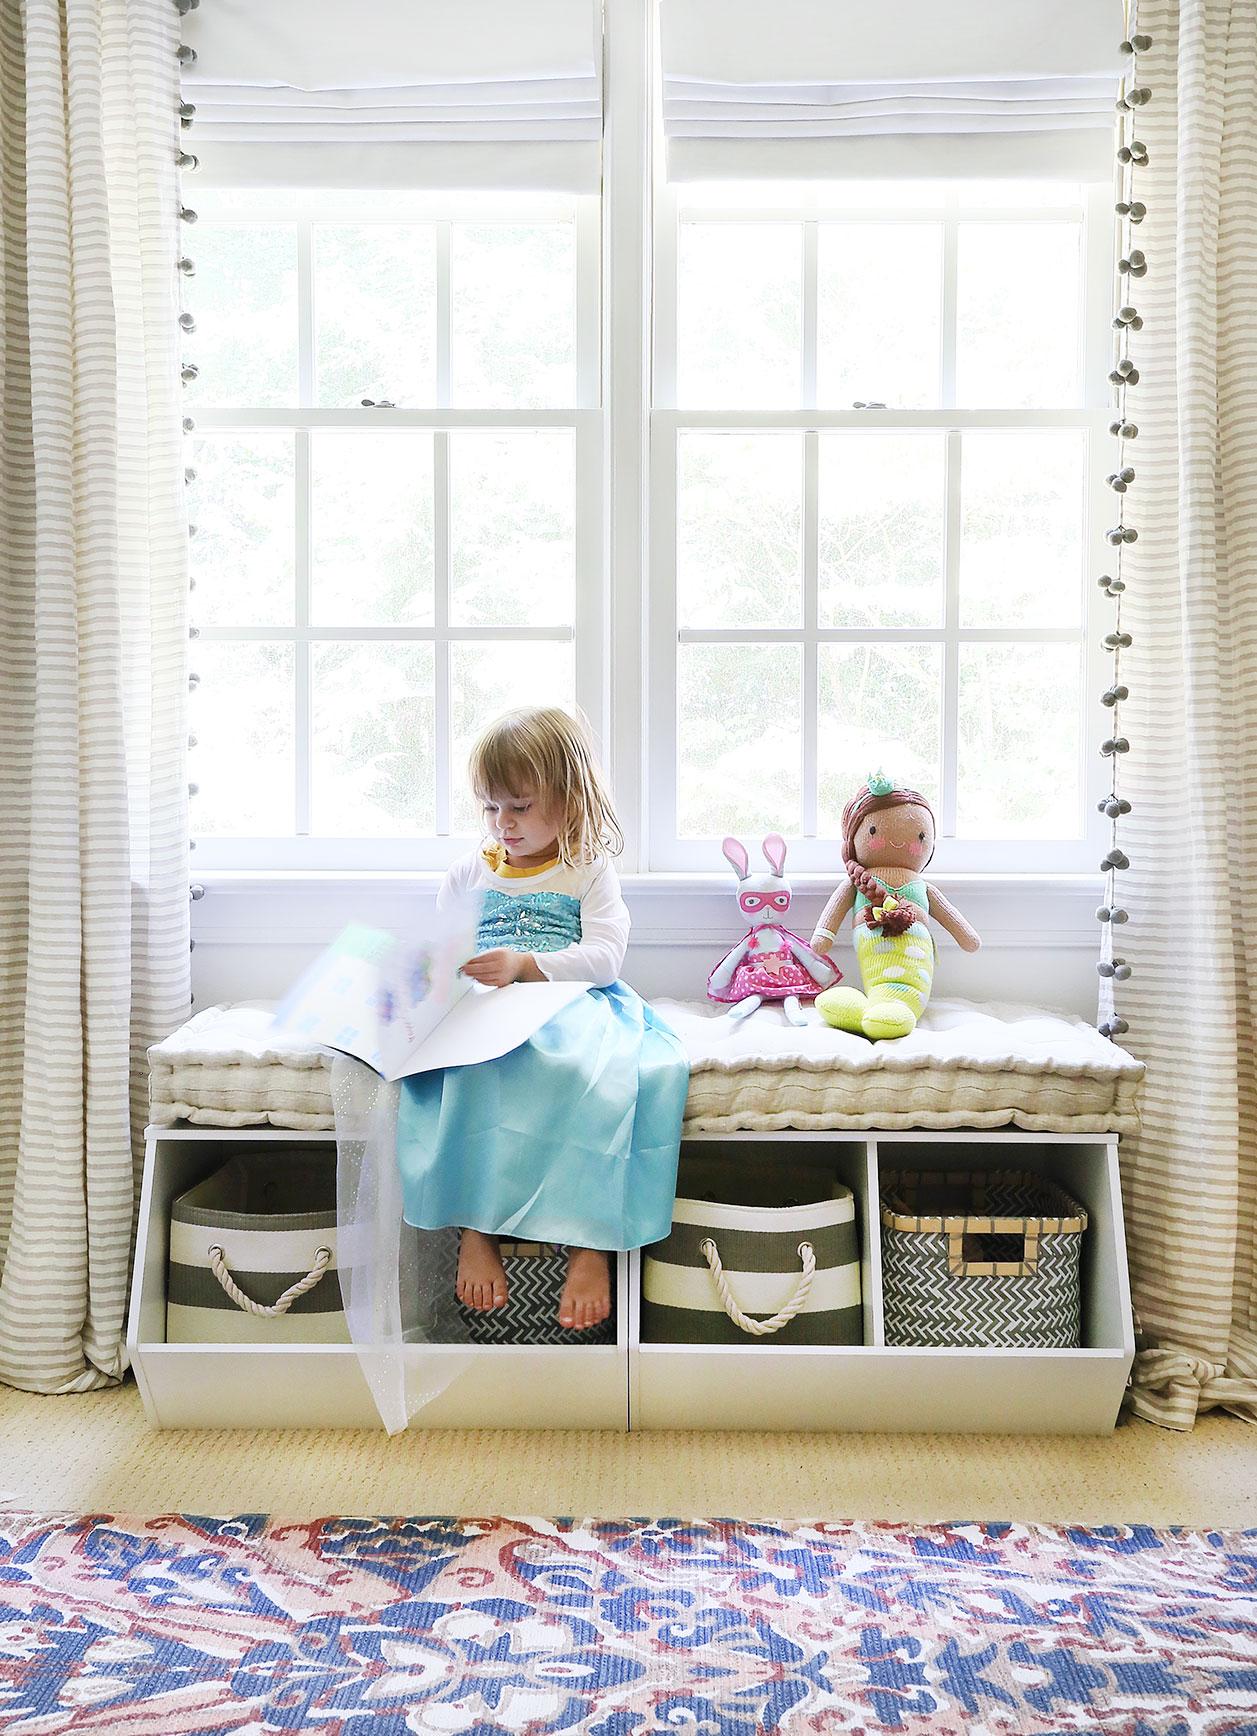 zora-bedroom-15-blog.jpg